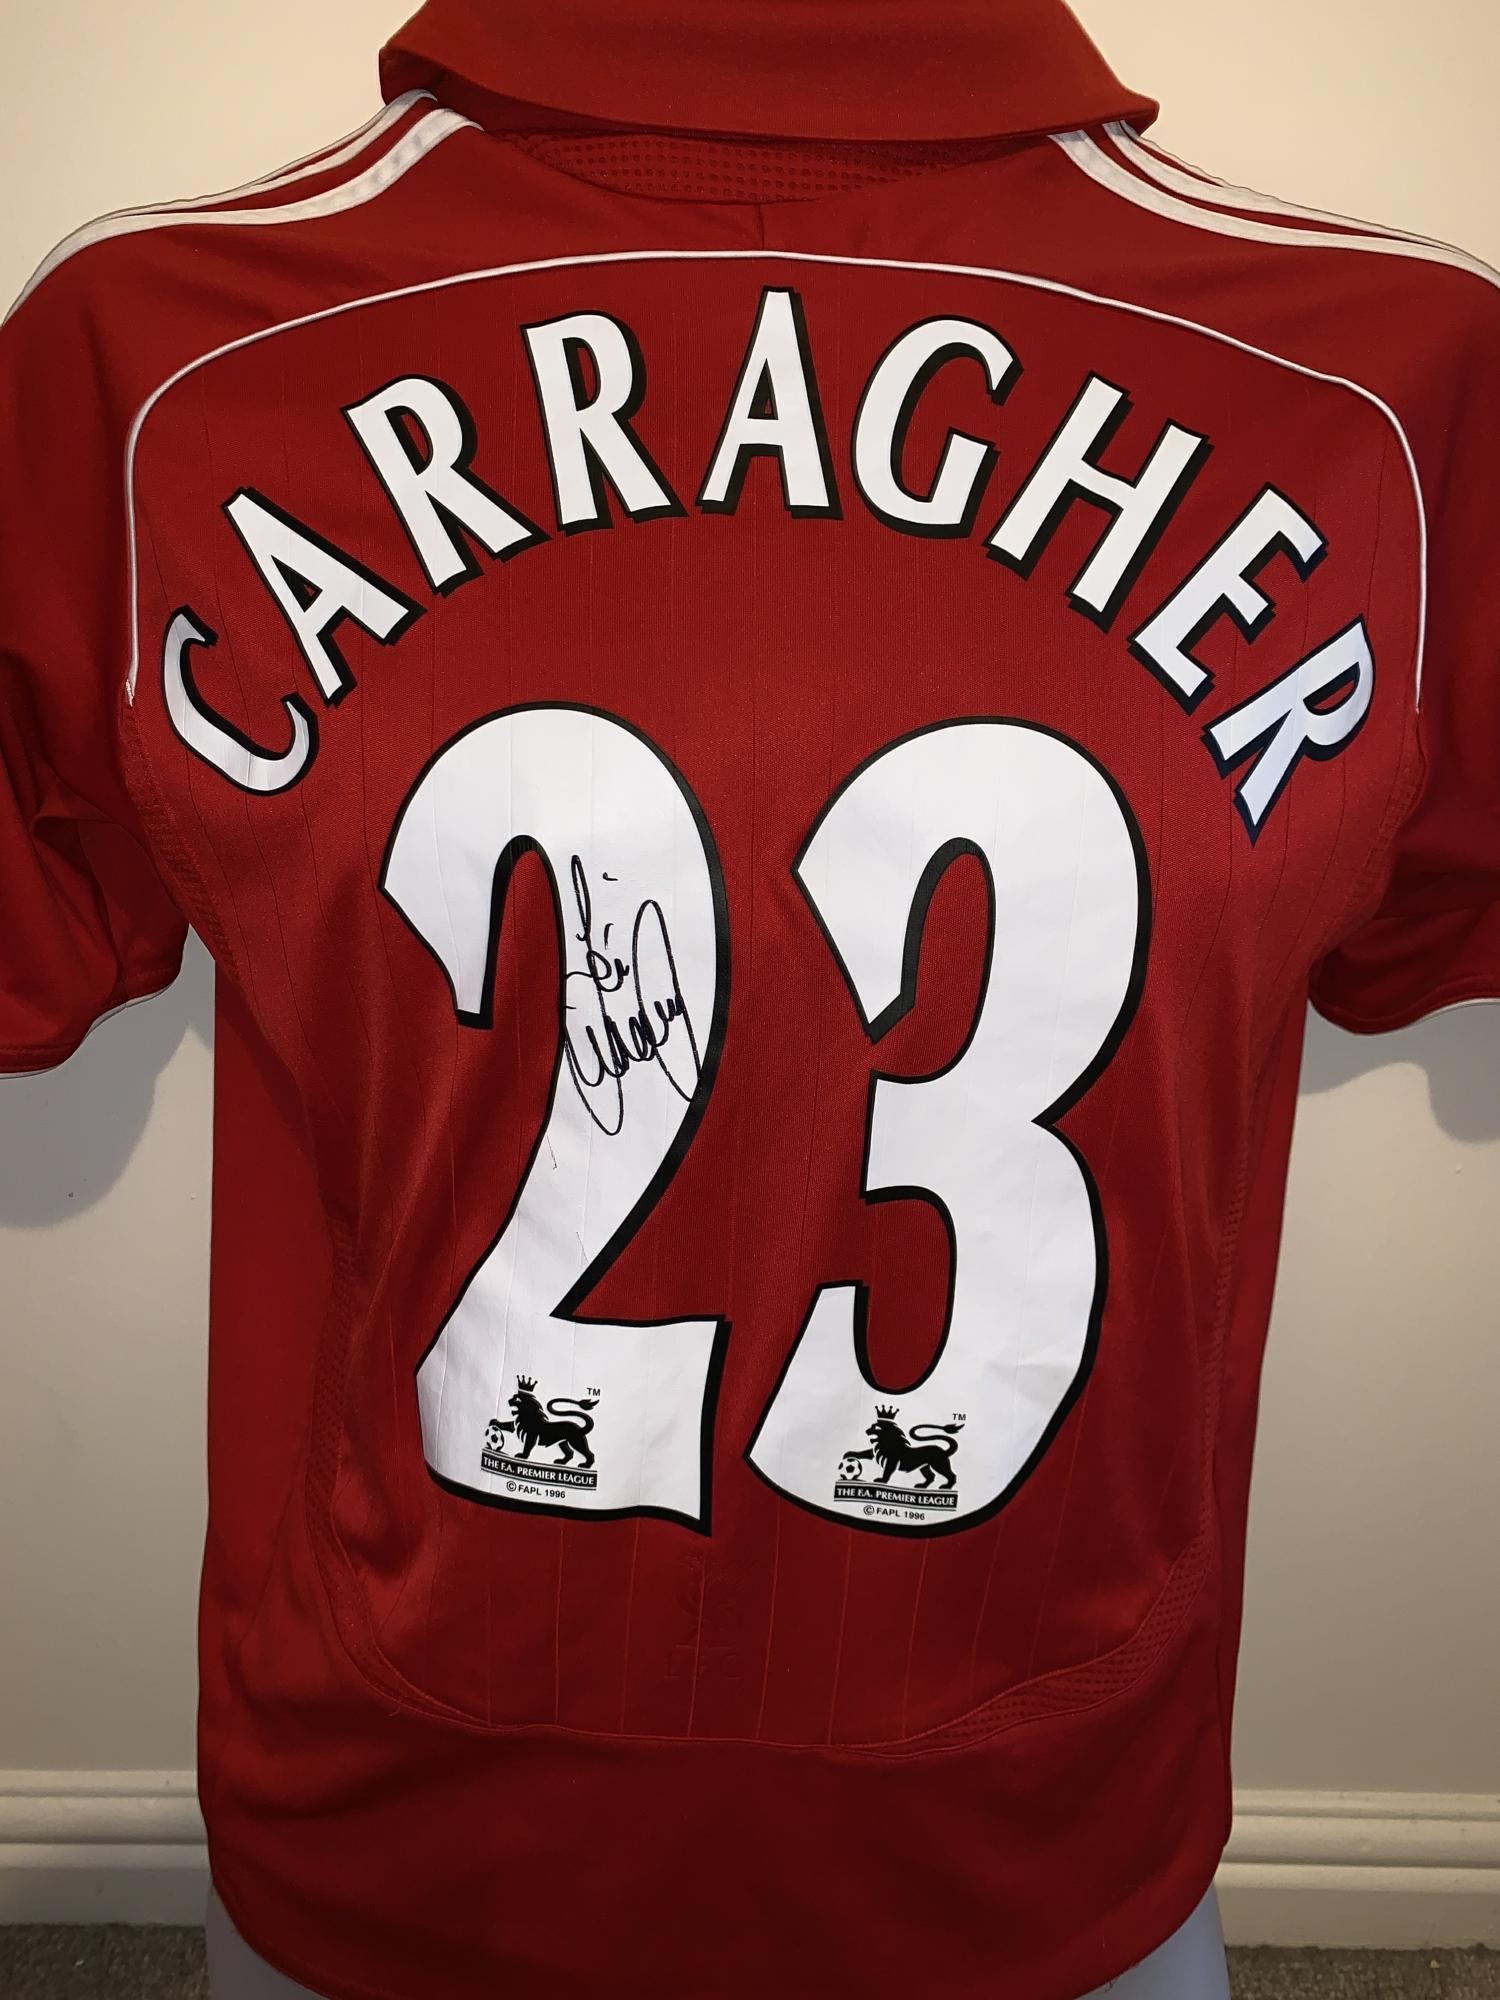 b775c2c26 Signed Jamie Carragher Liverpool Shirt